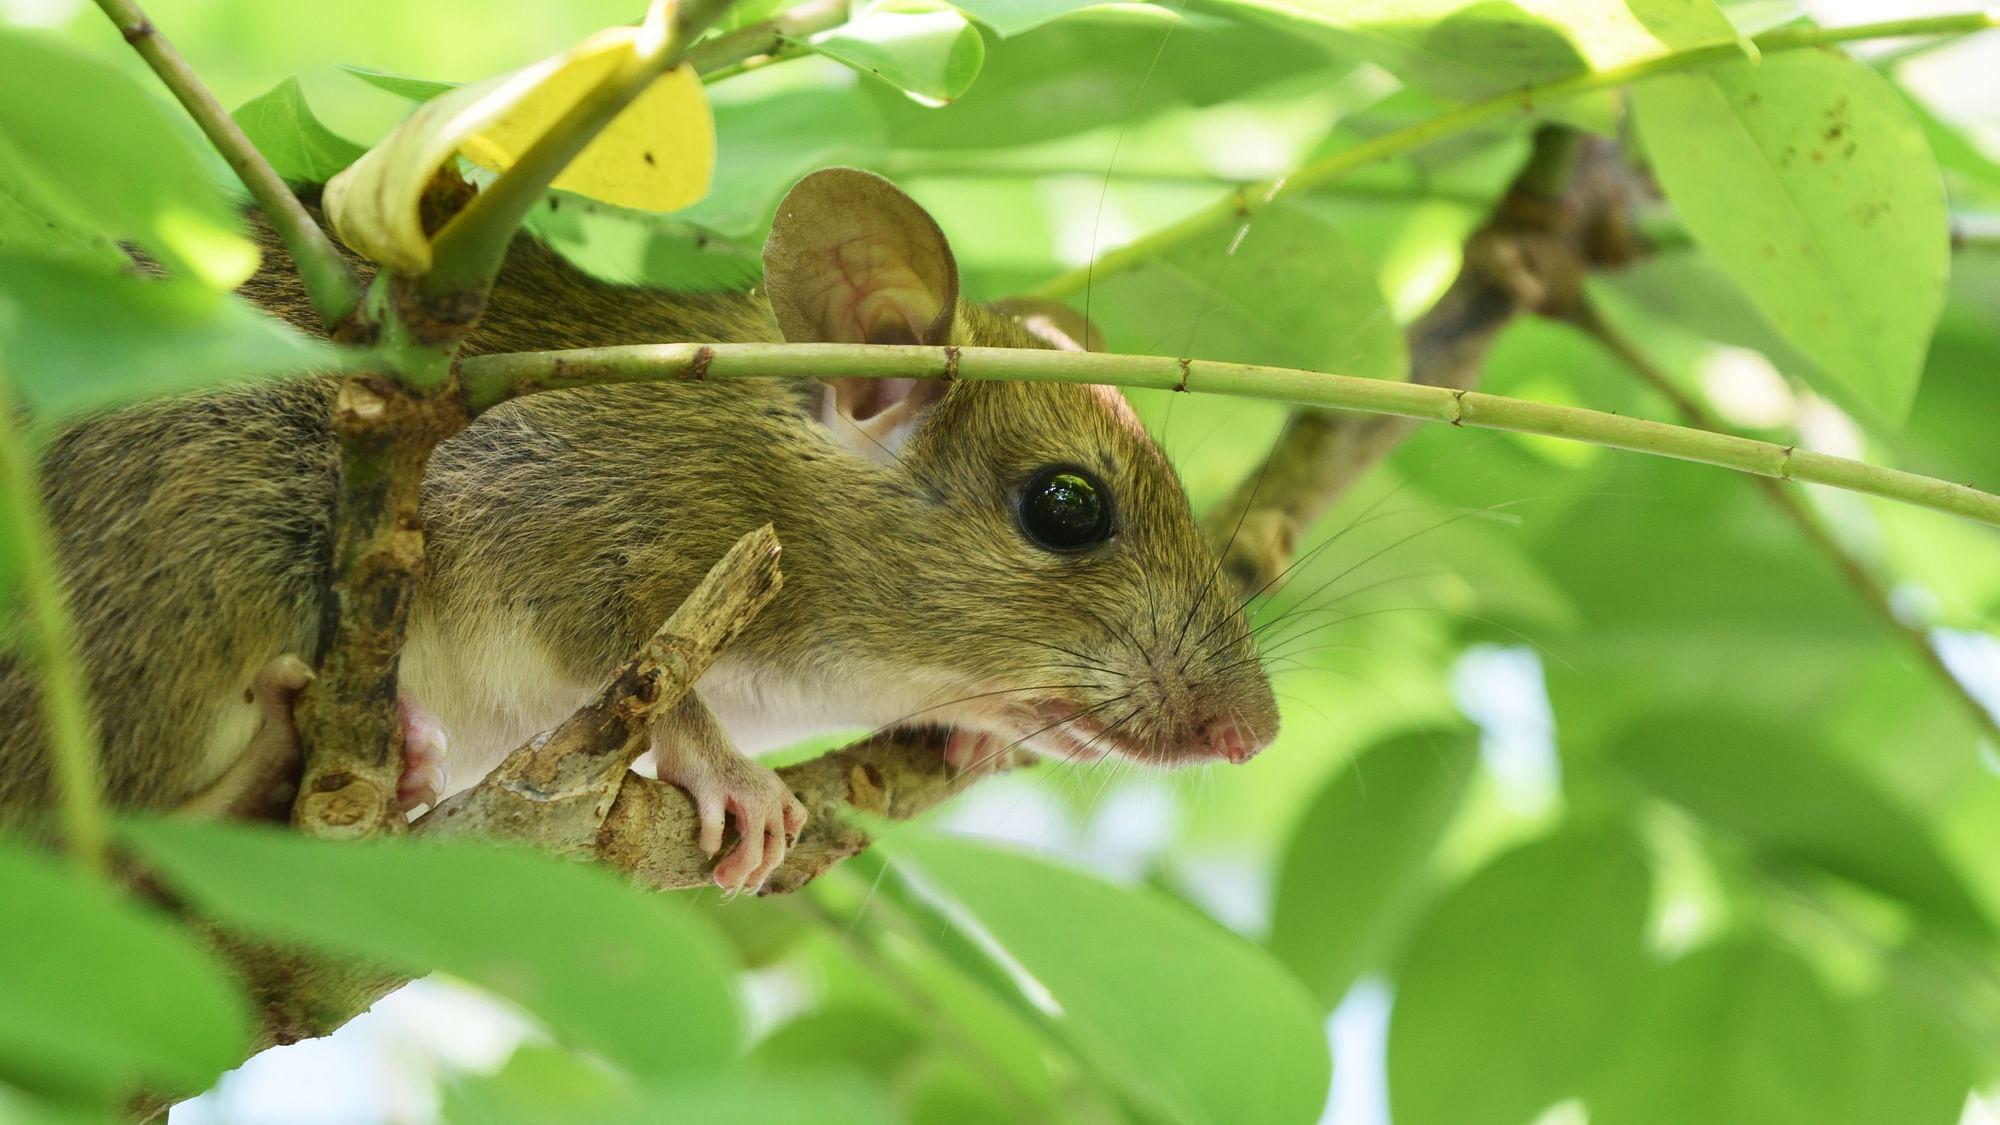 Hantavirus Explained: No Need to Worry Say Experts